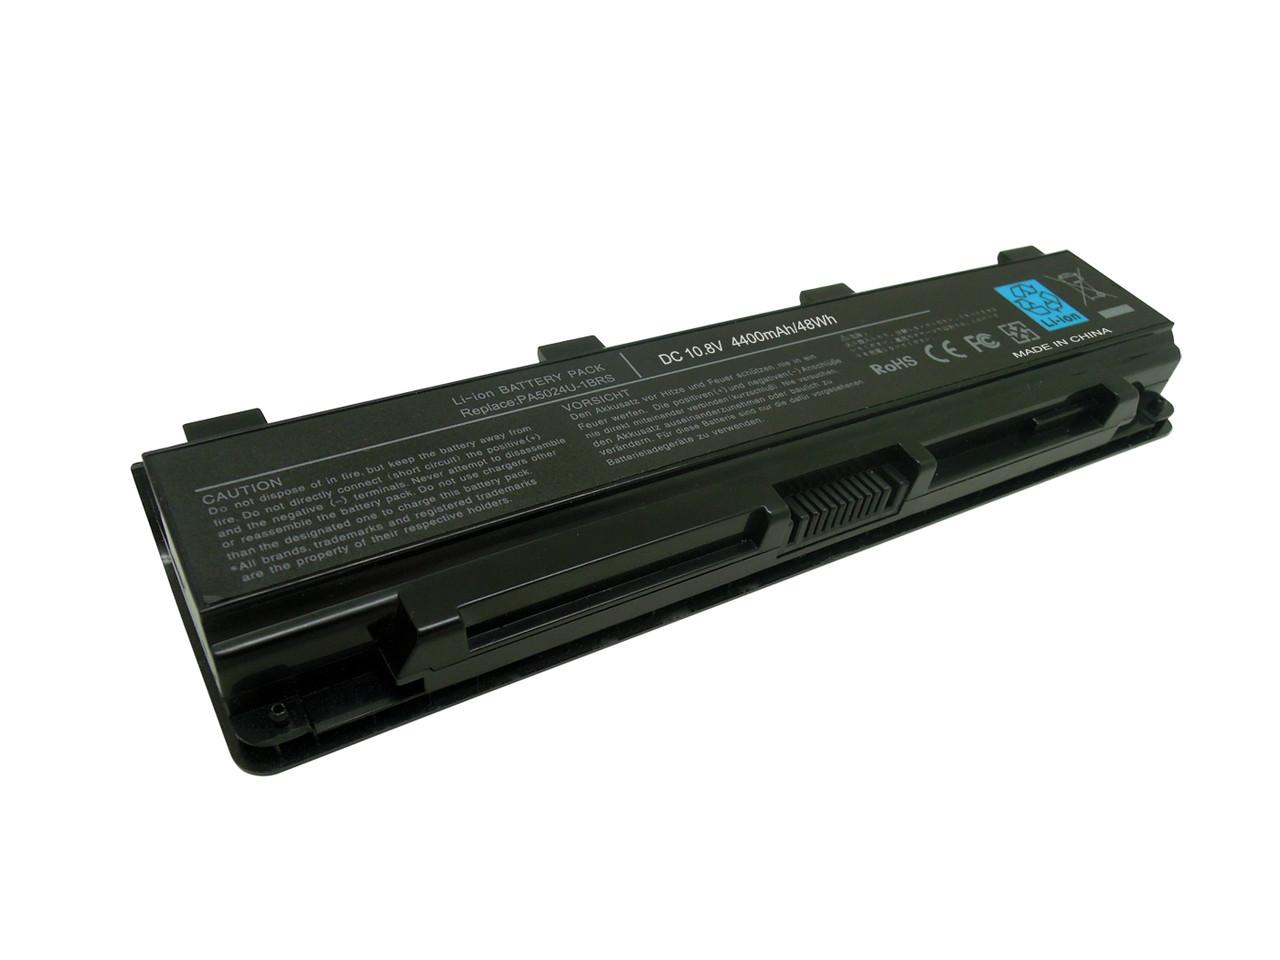 Аккумулятор для ноутбука TOSHIBA SATELLITE C855D-S5357